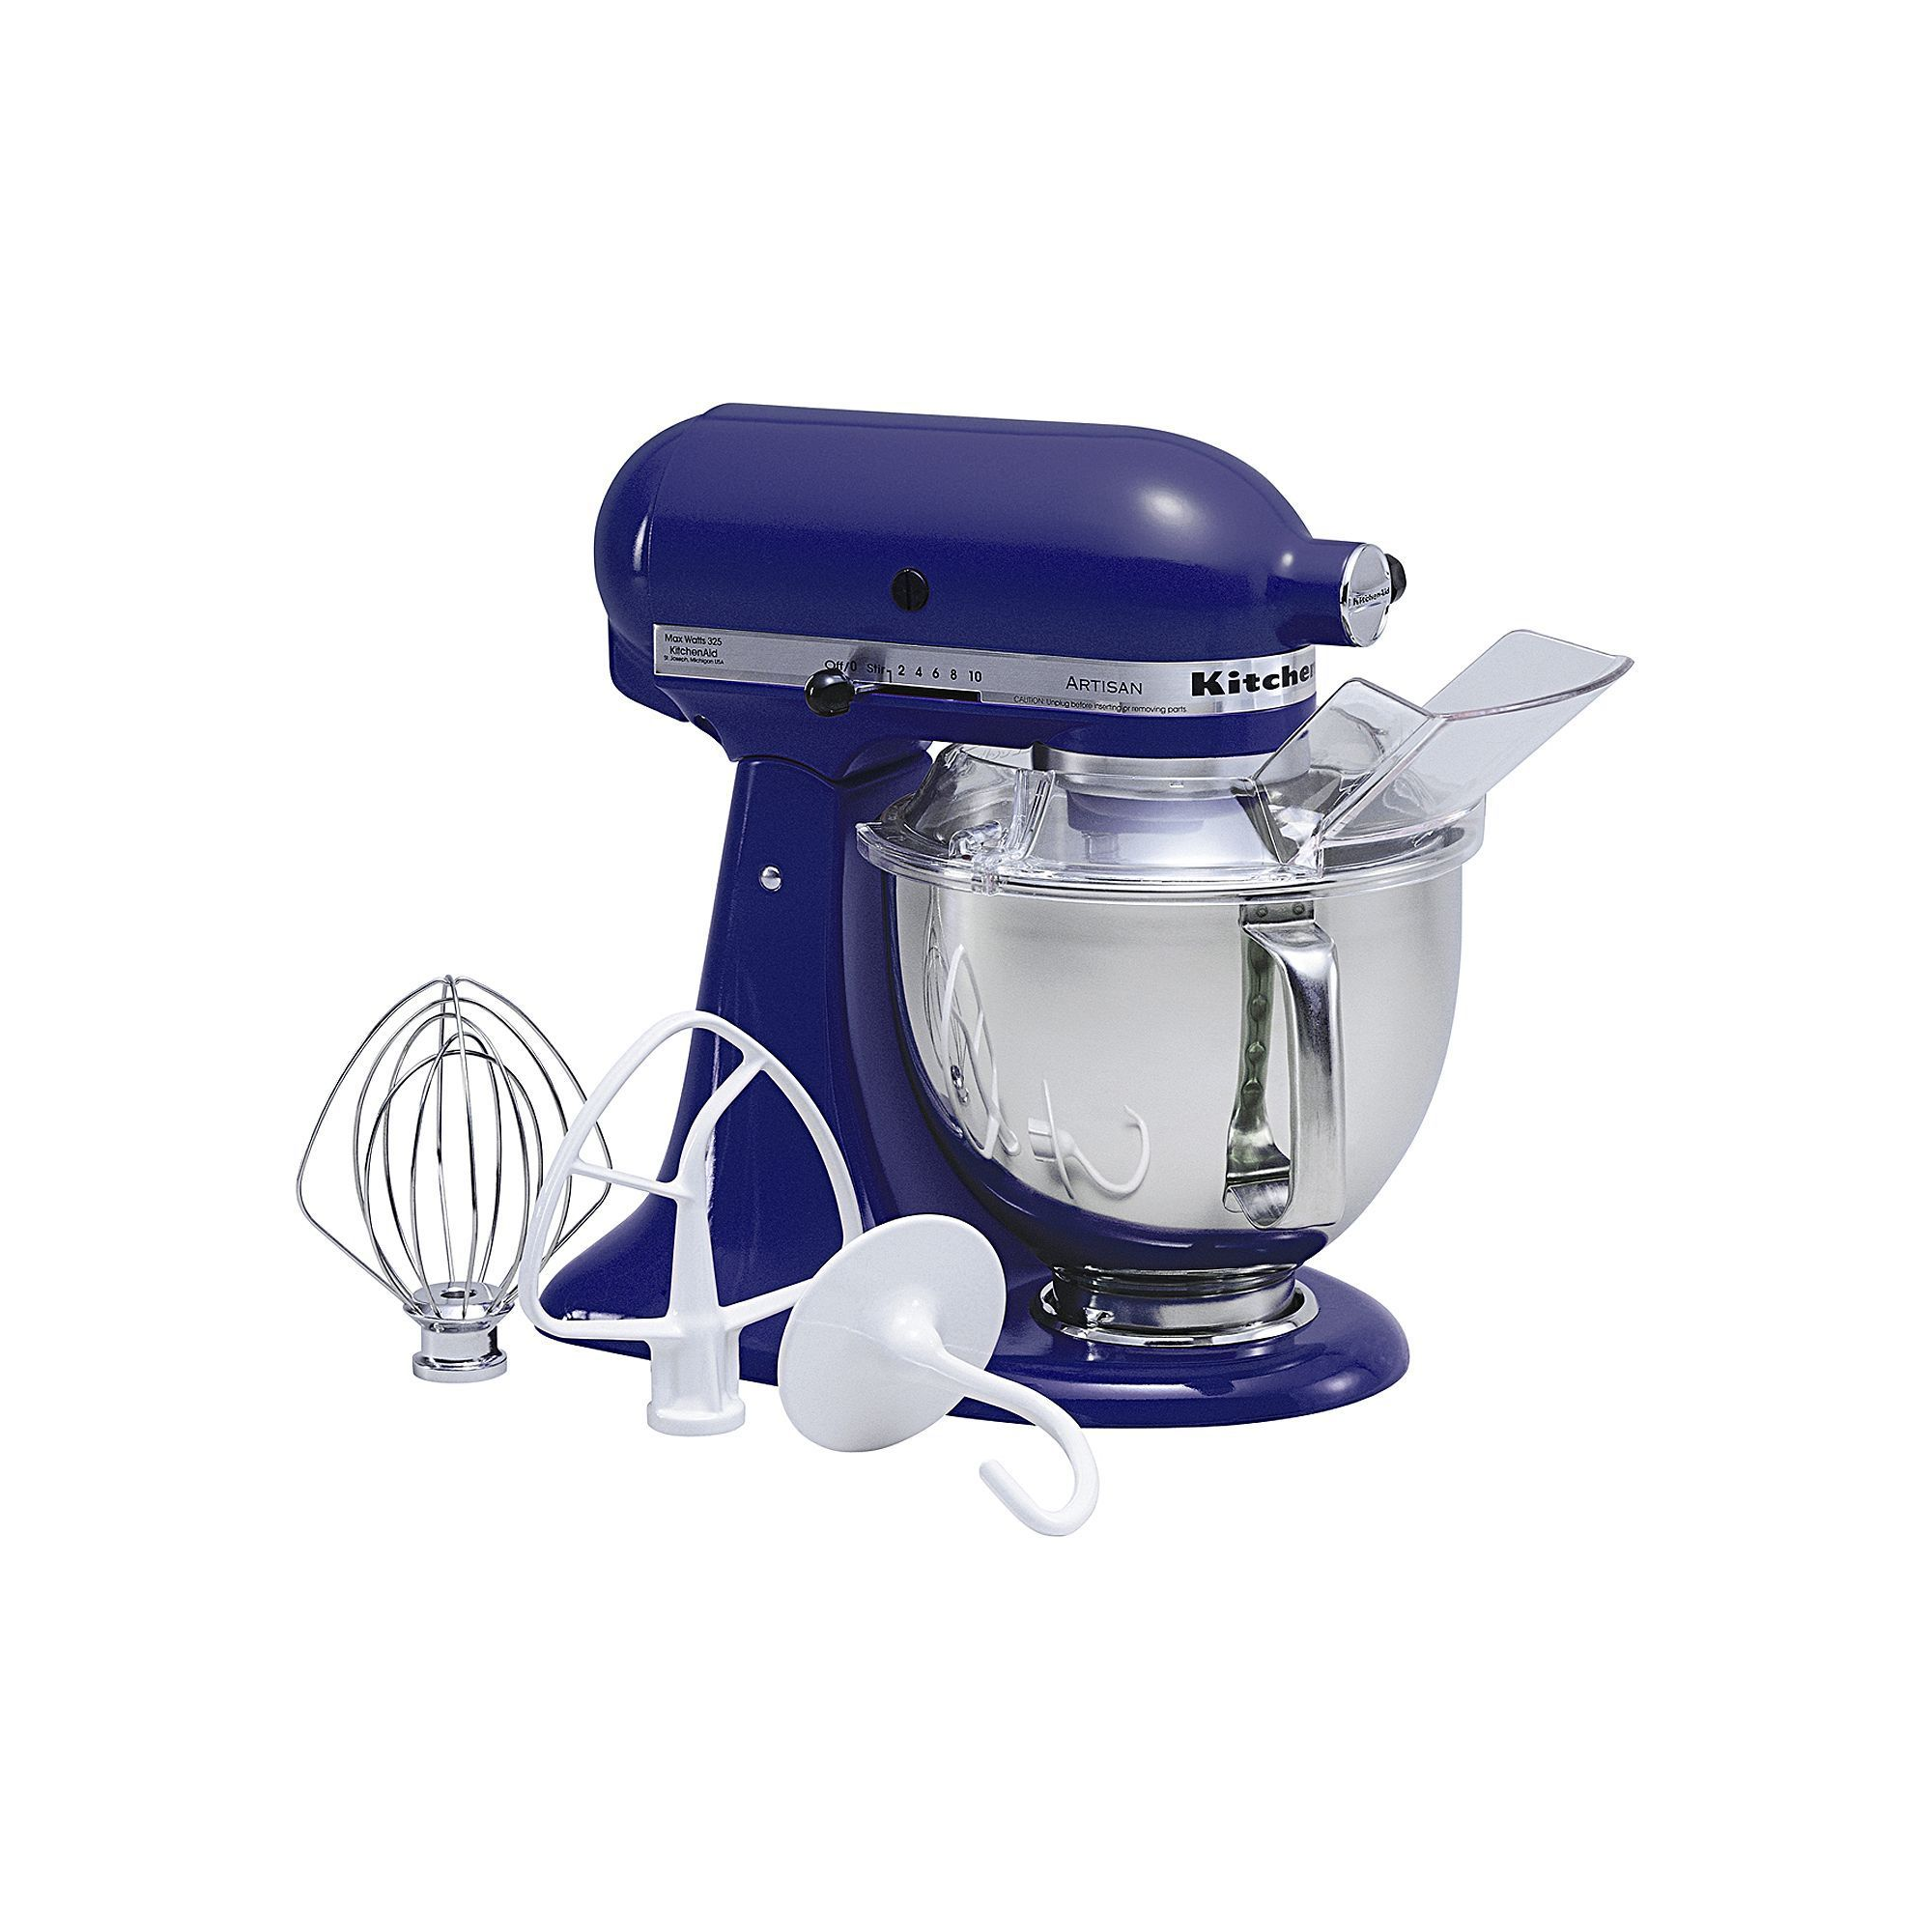 Kitchenaid ksm150ps artisan 5qt stand mixer blue